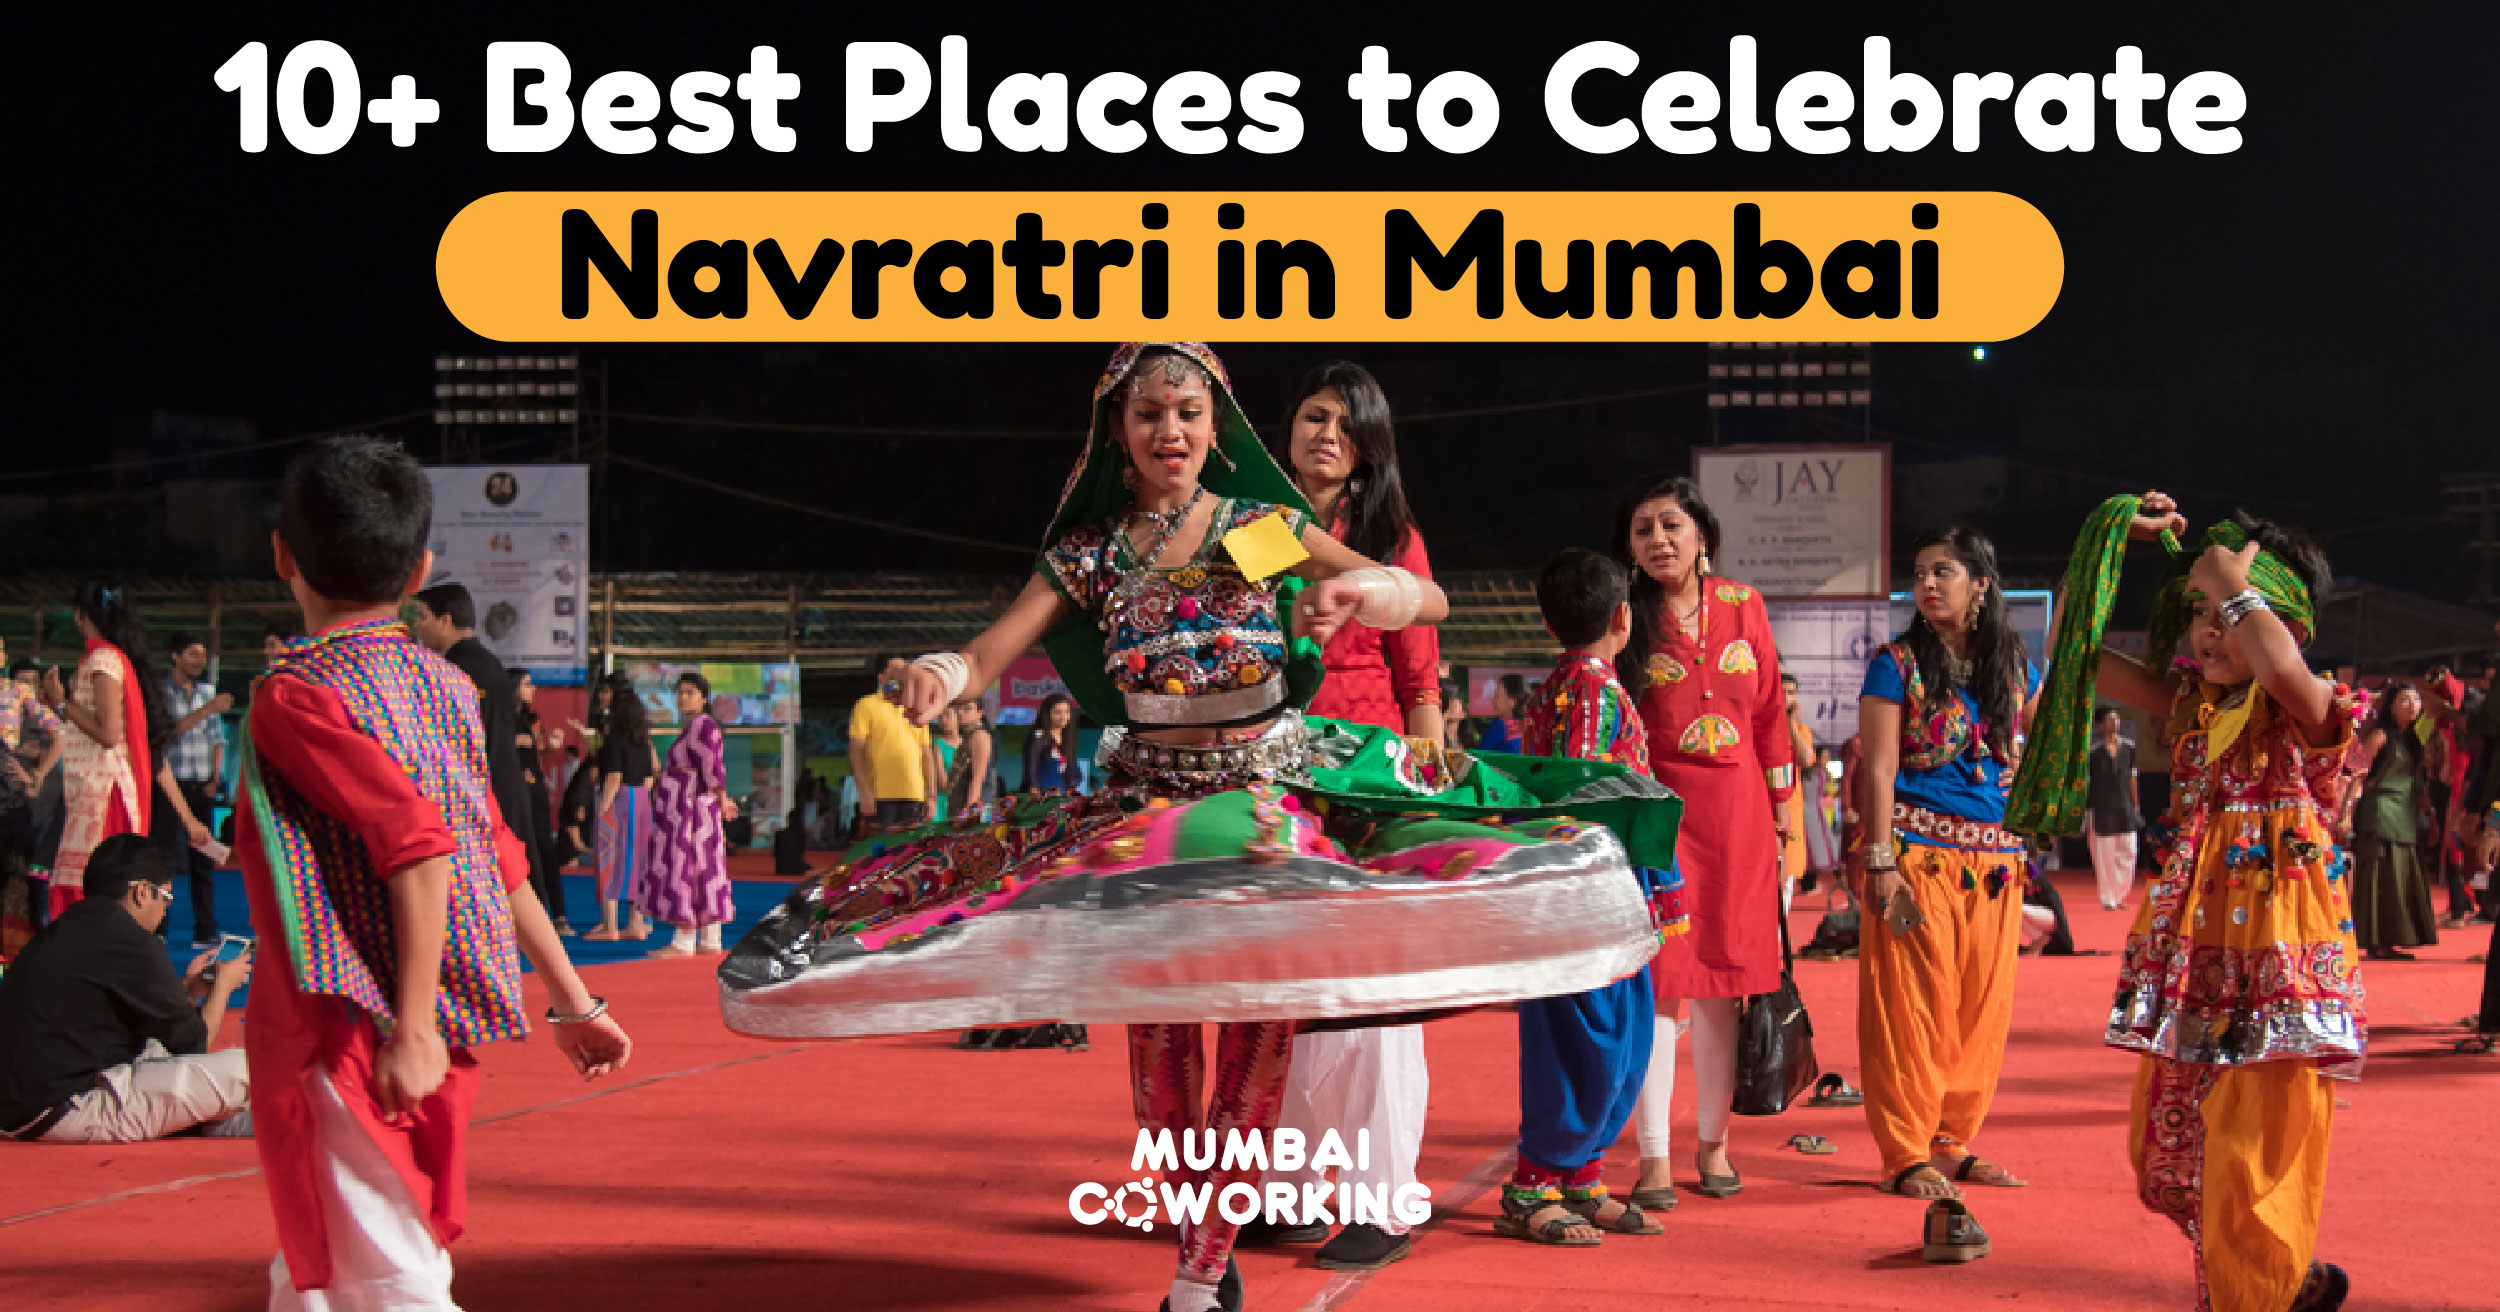 Garba 2019: 10+ Best Places To Celebrate Navratri In Mumbai - Coworking Space In Mumbai